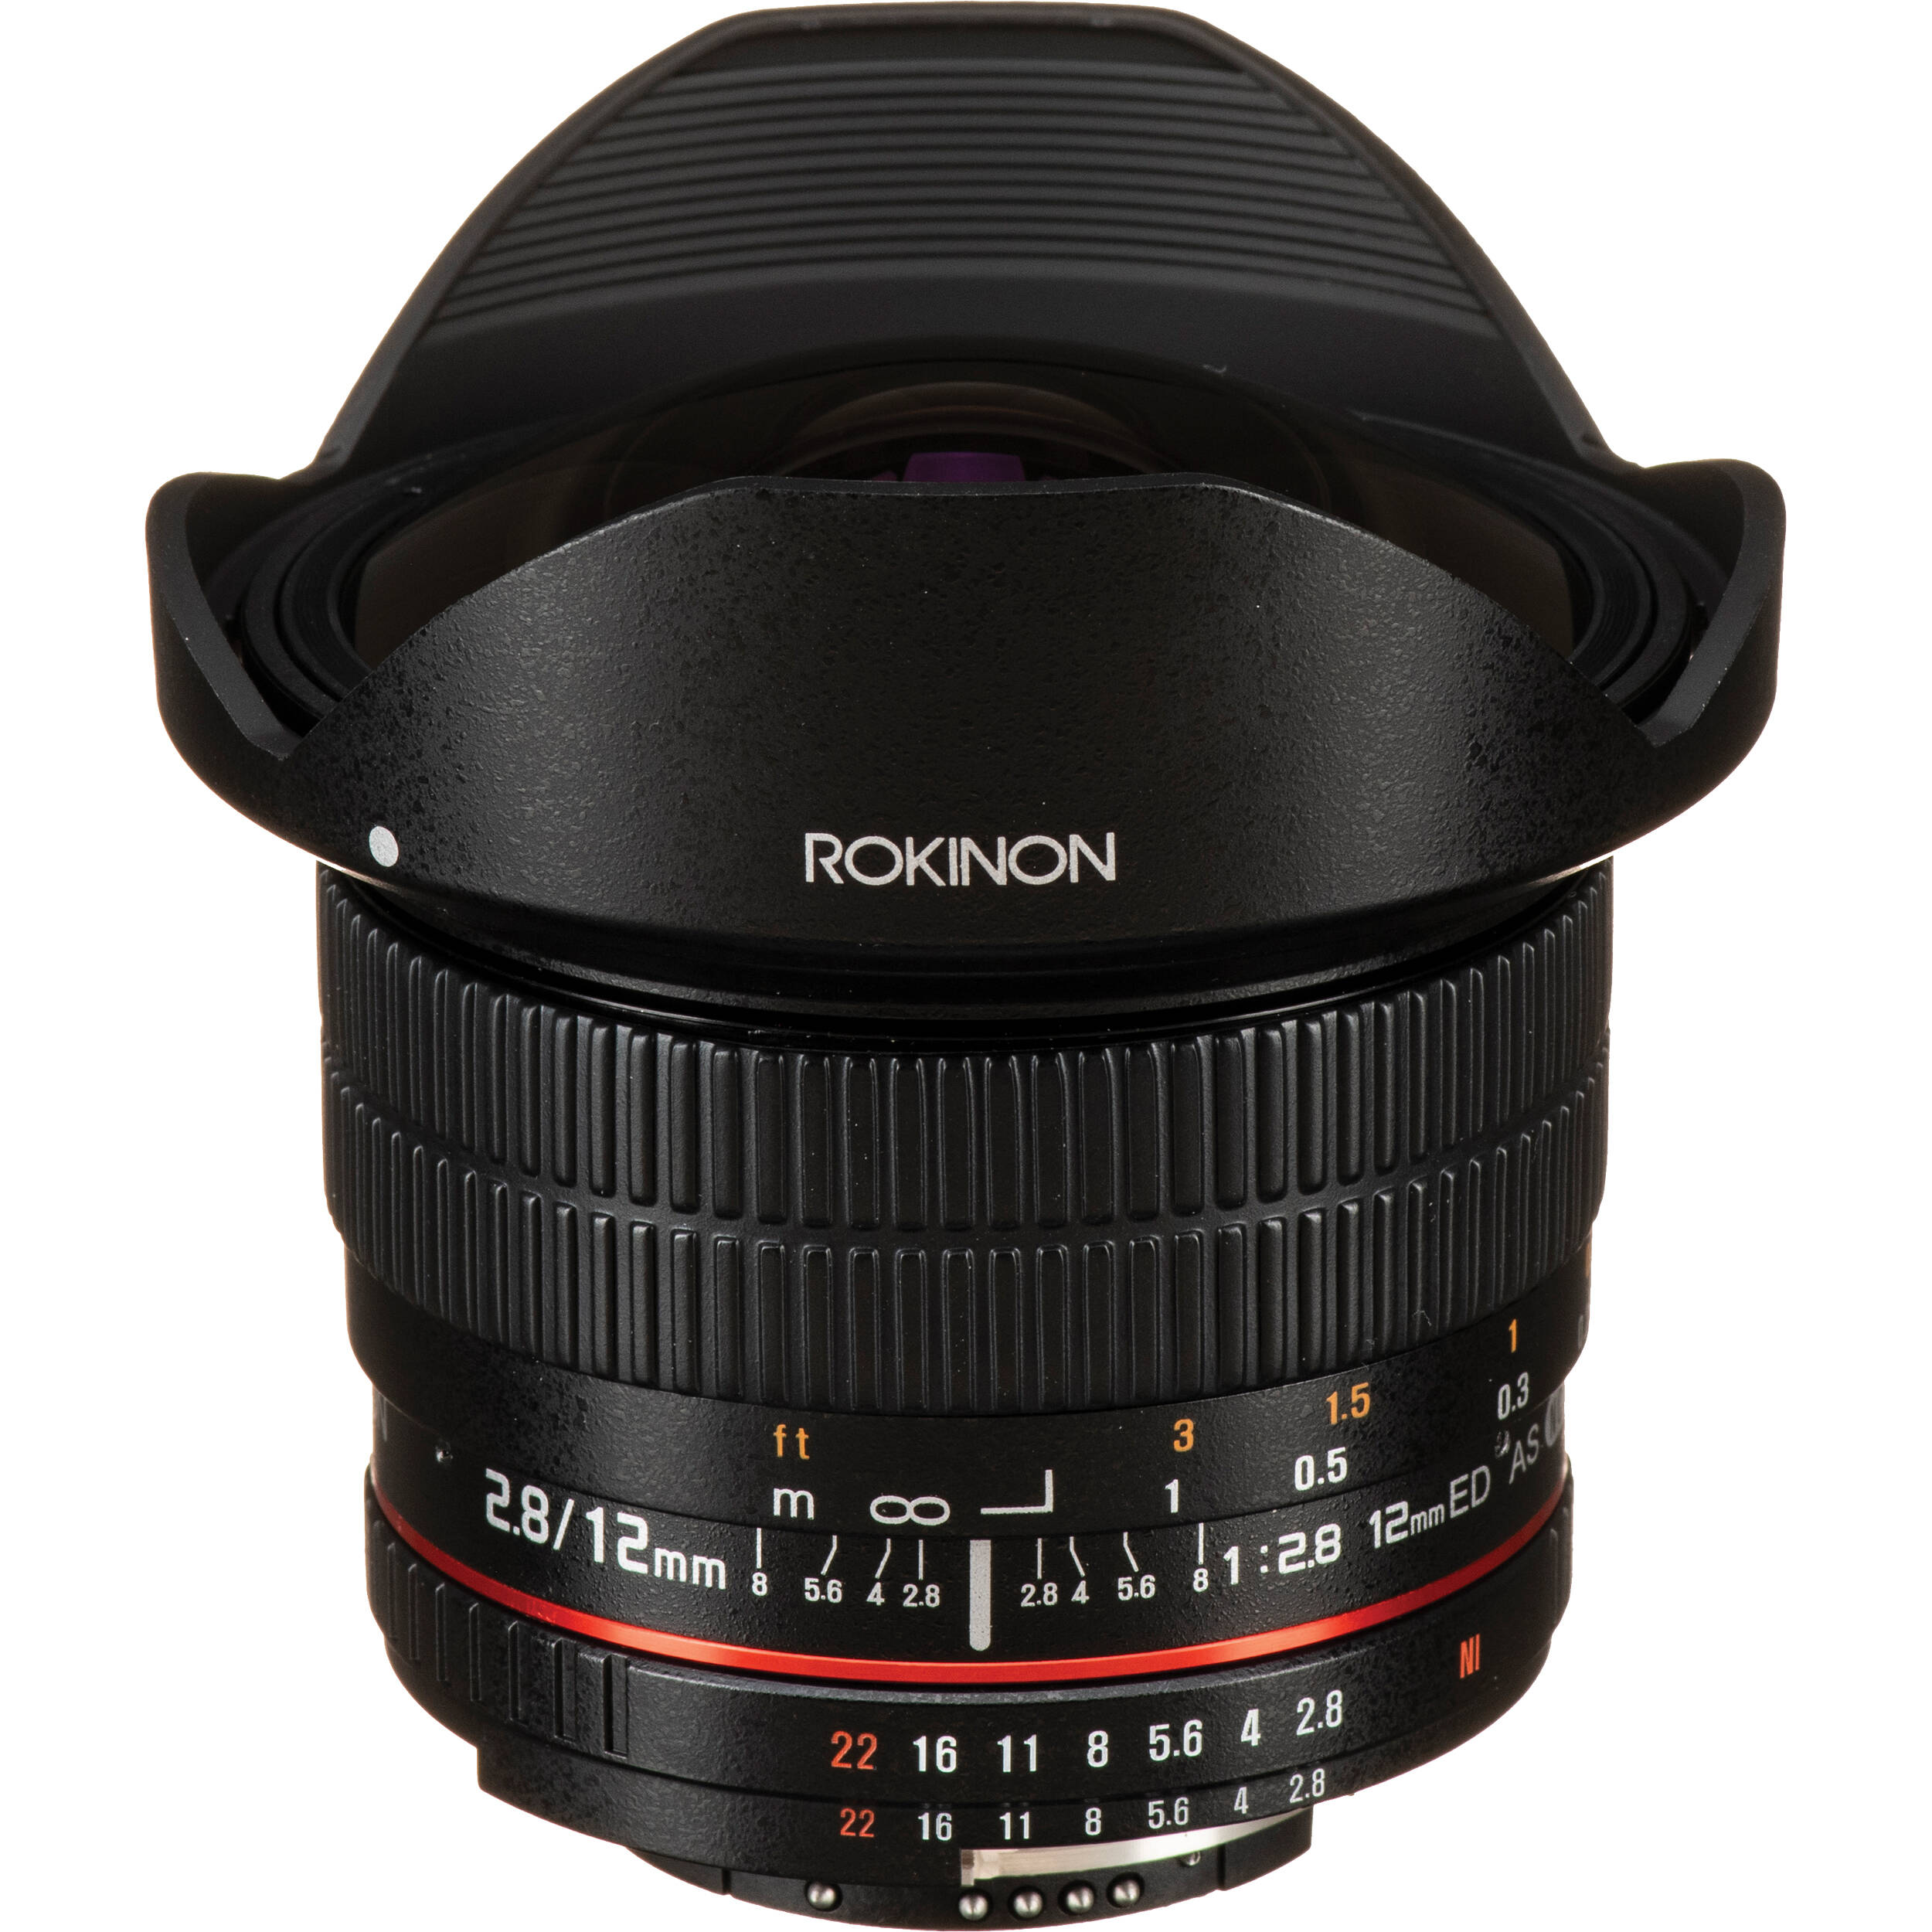 Rokinon 12mm f 2 8 ed as if ncs umc fisheye lens for nikon for Fish eye camera